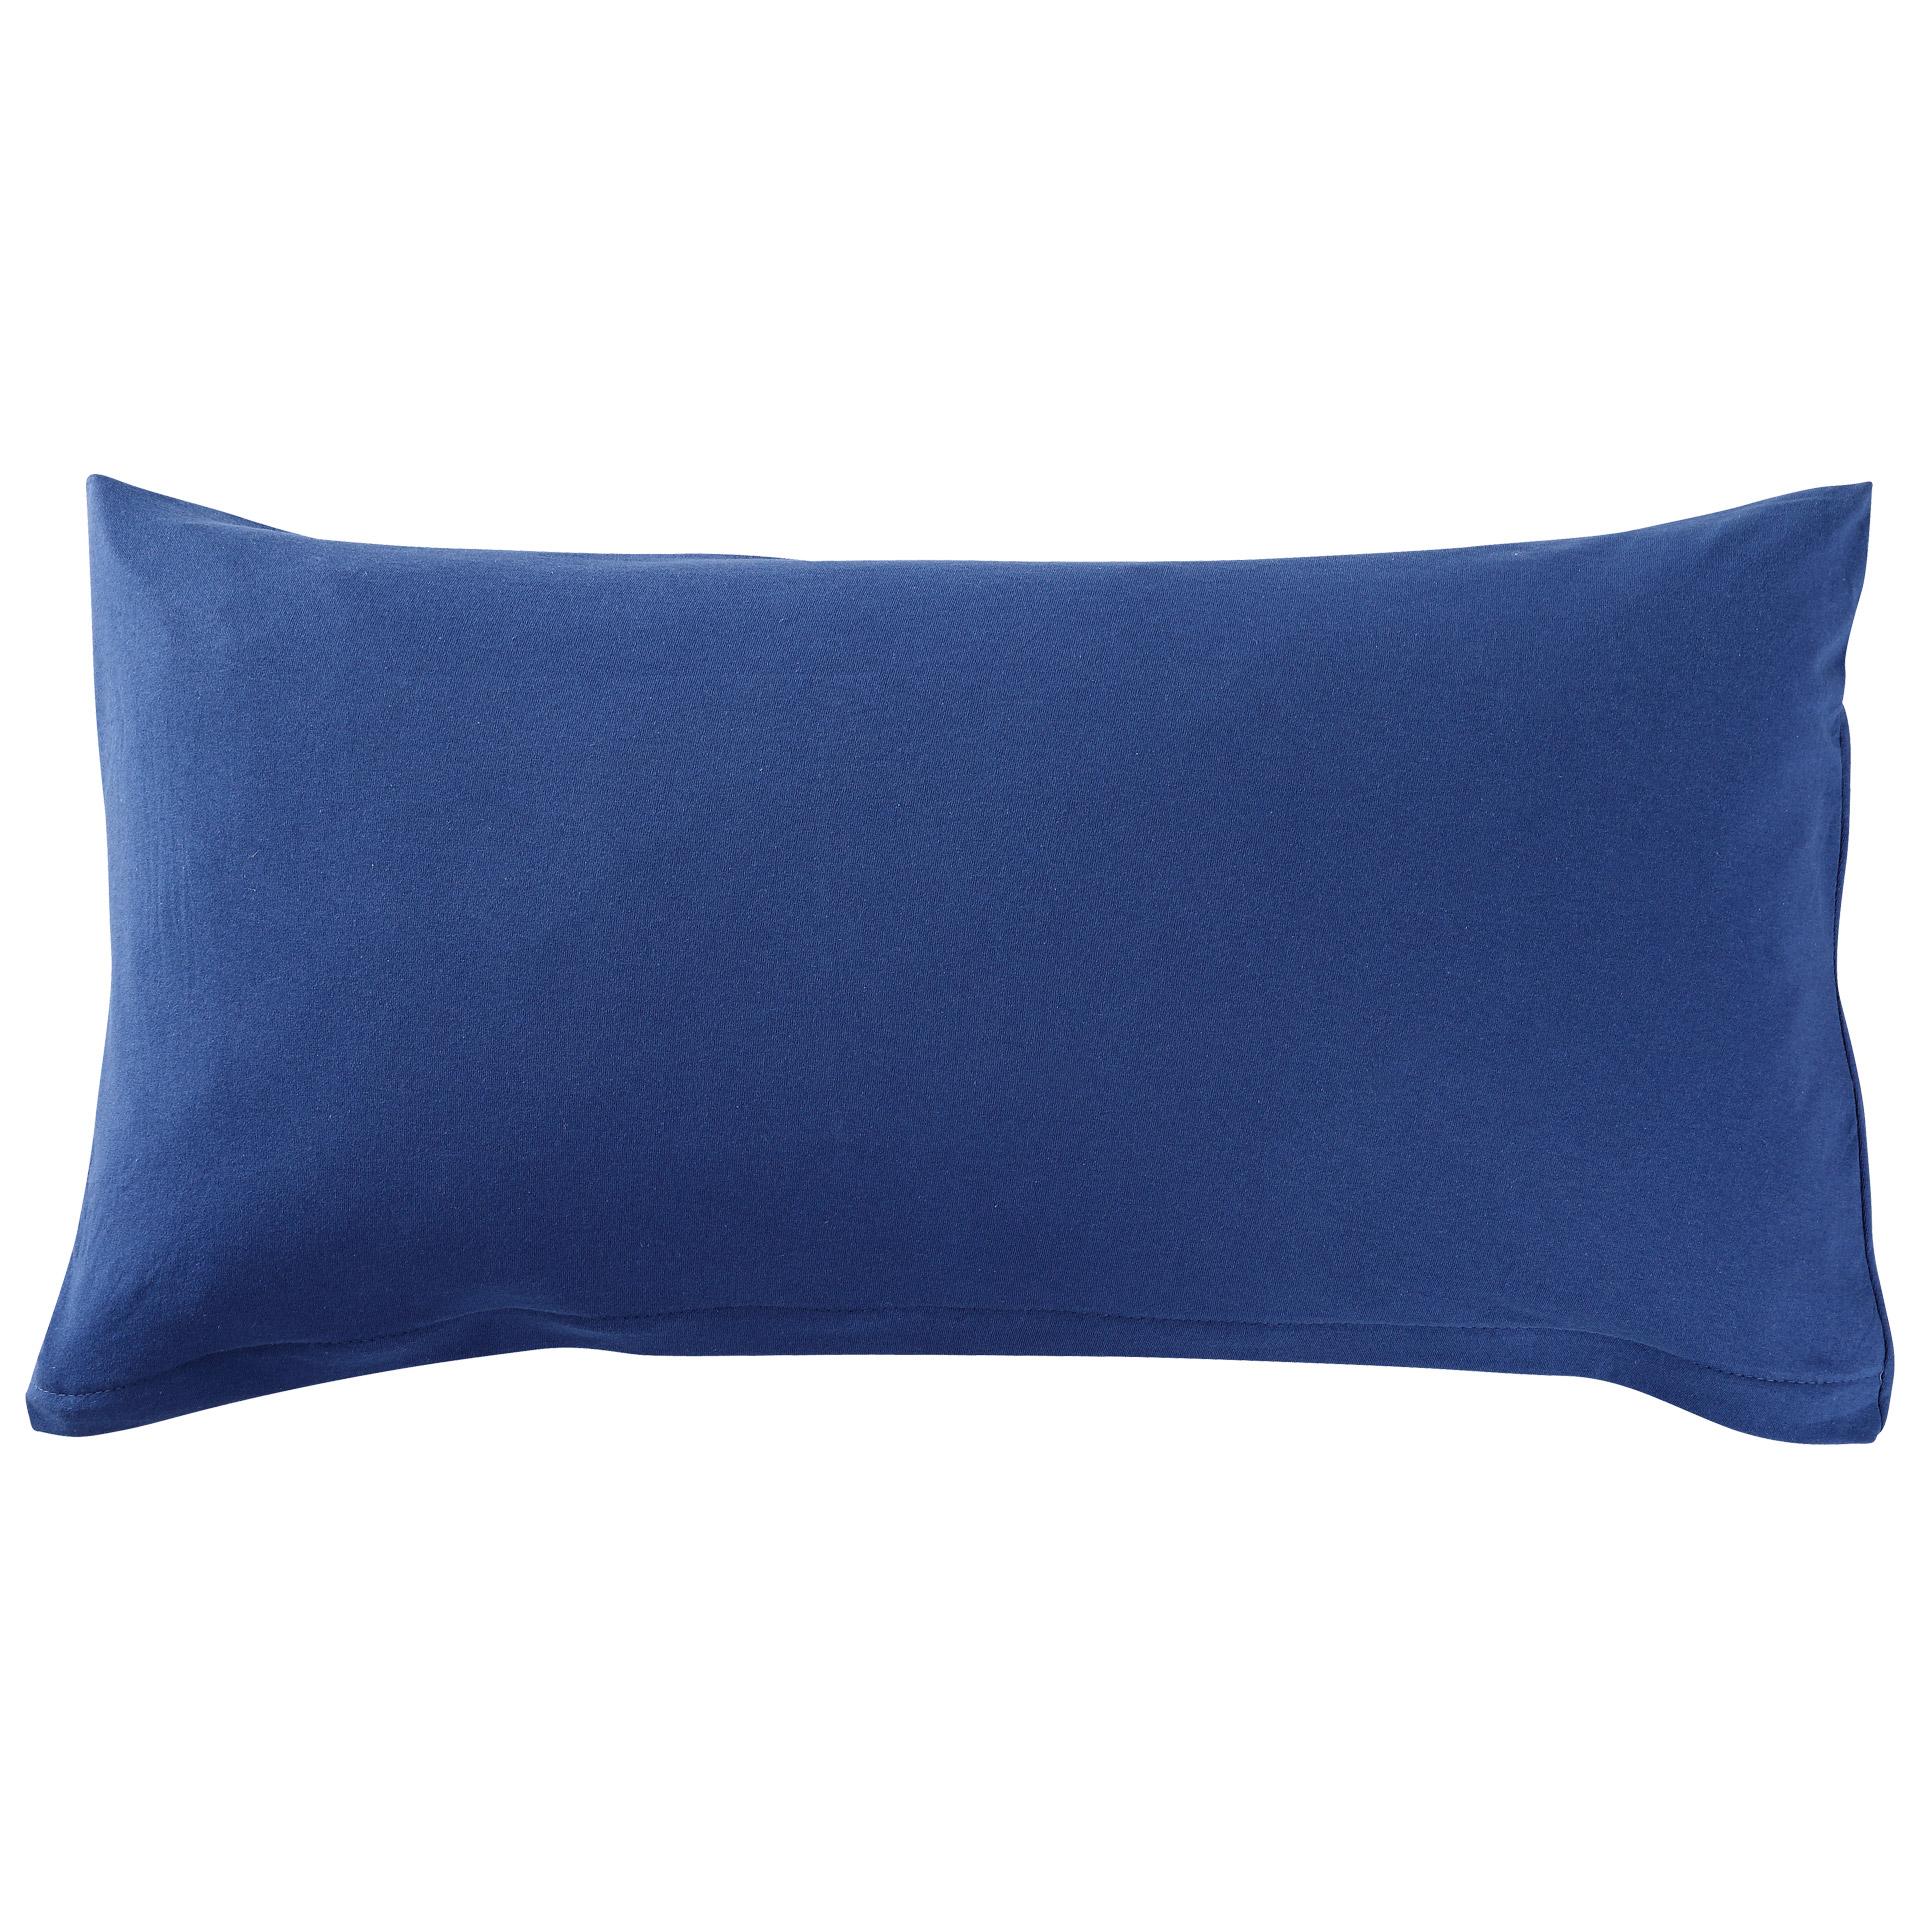 Fein-Jersey-Kissenbezug (40x80, marineblau)